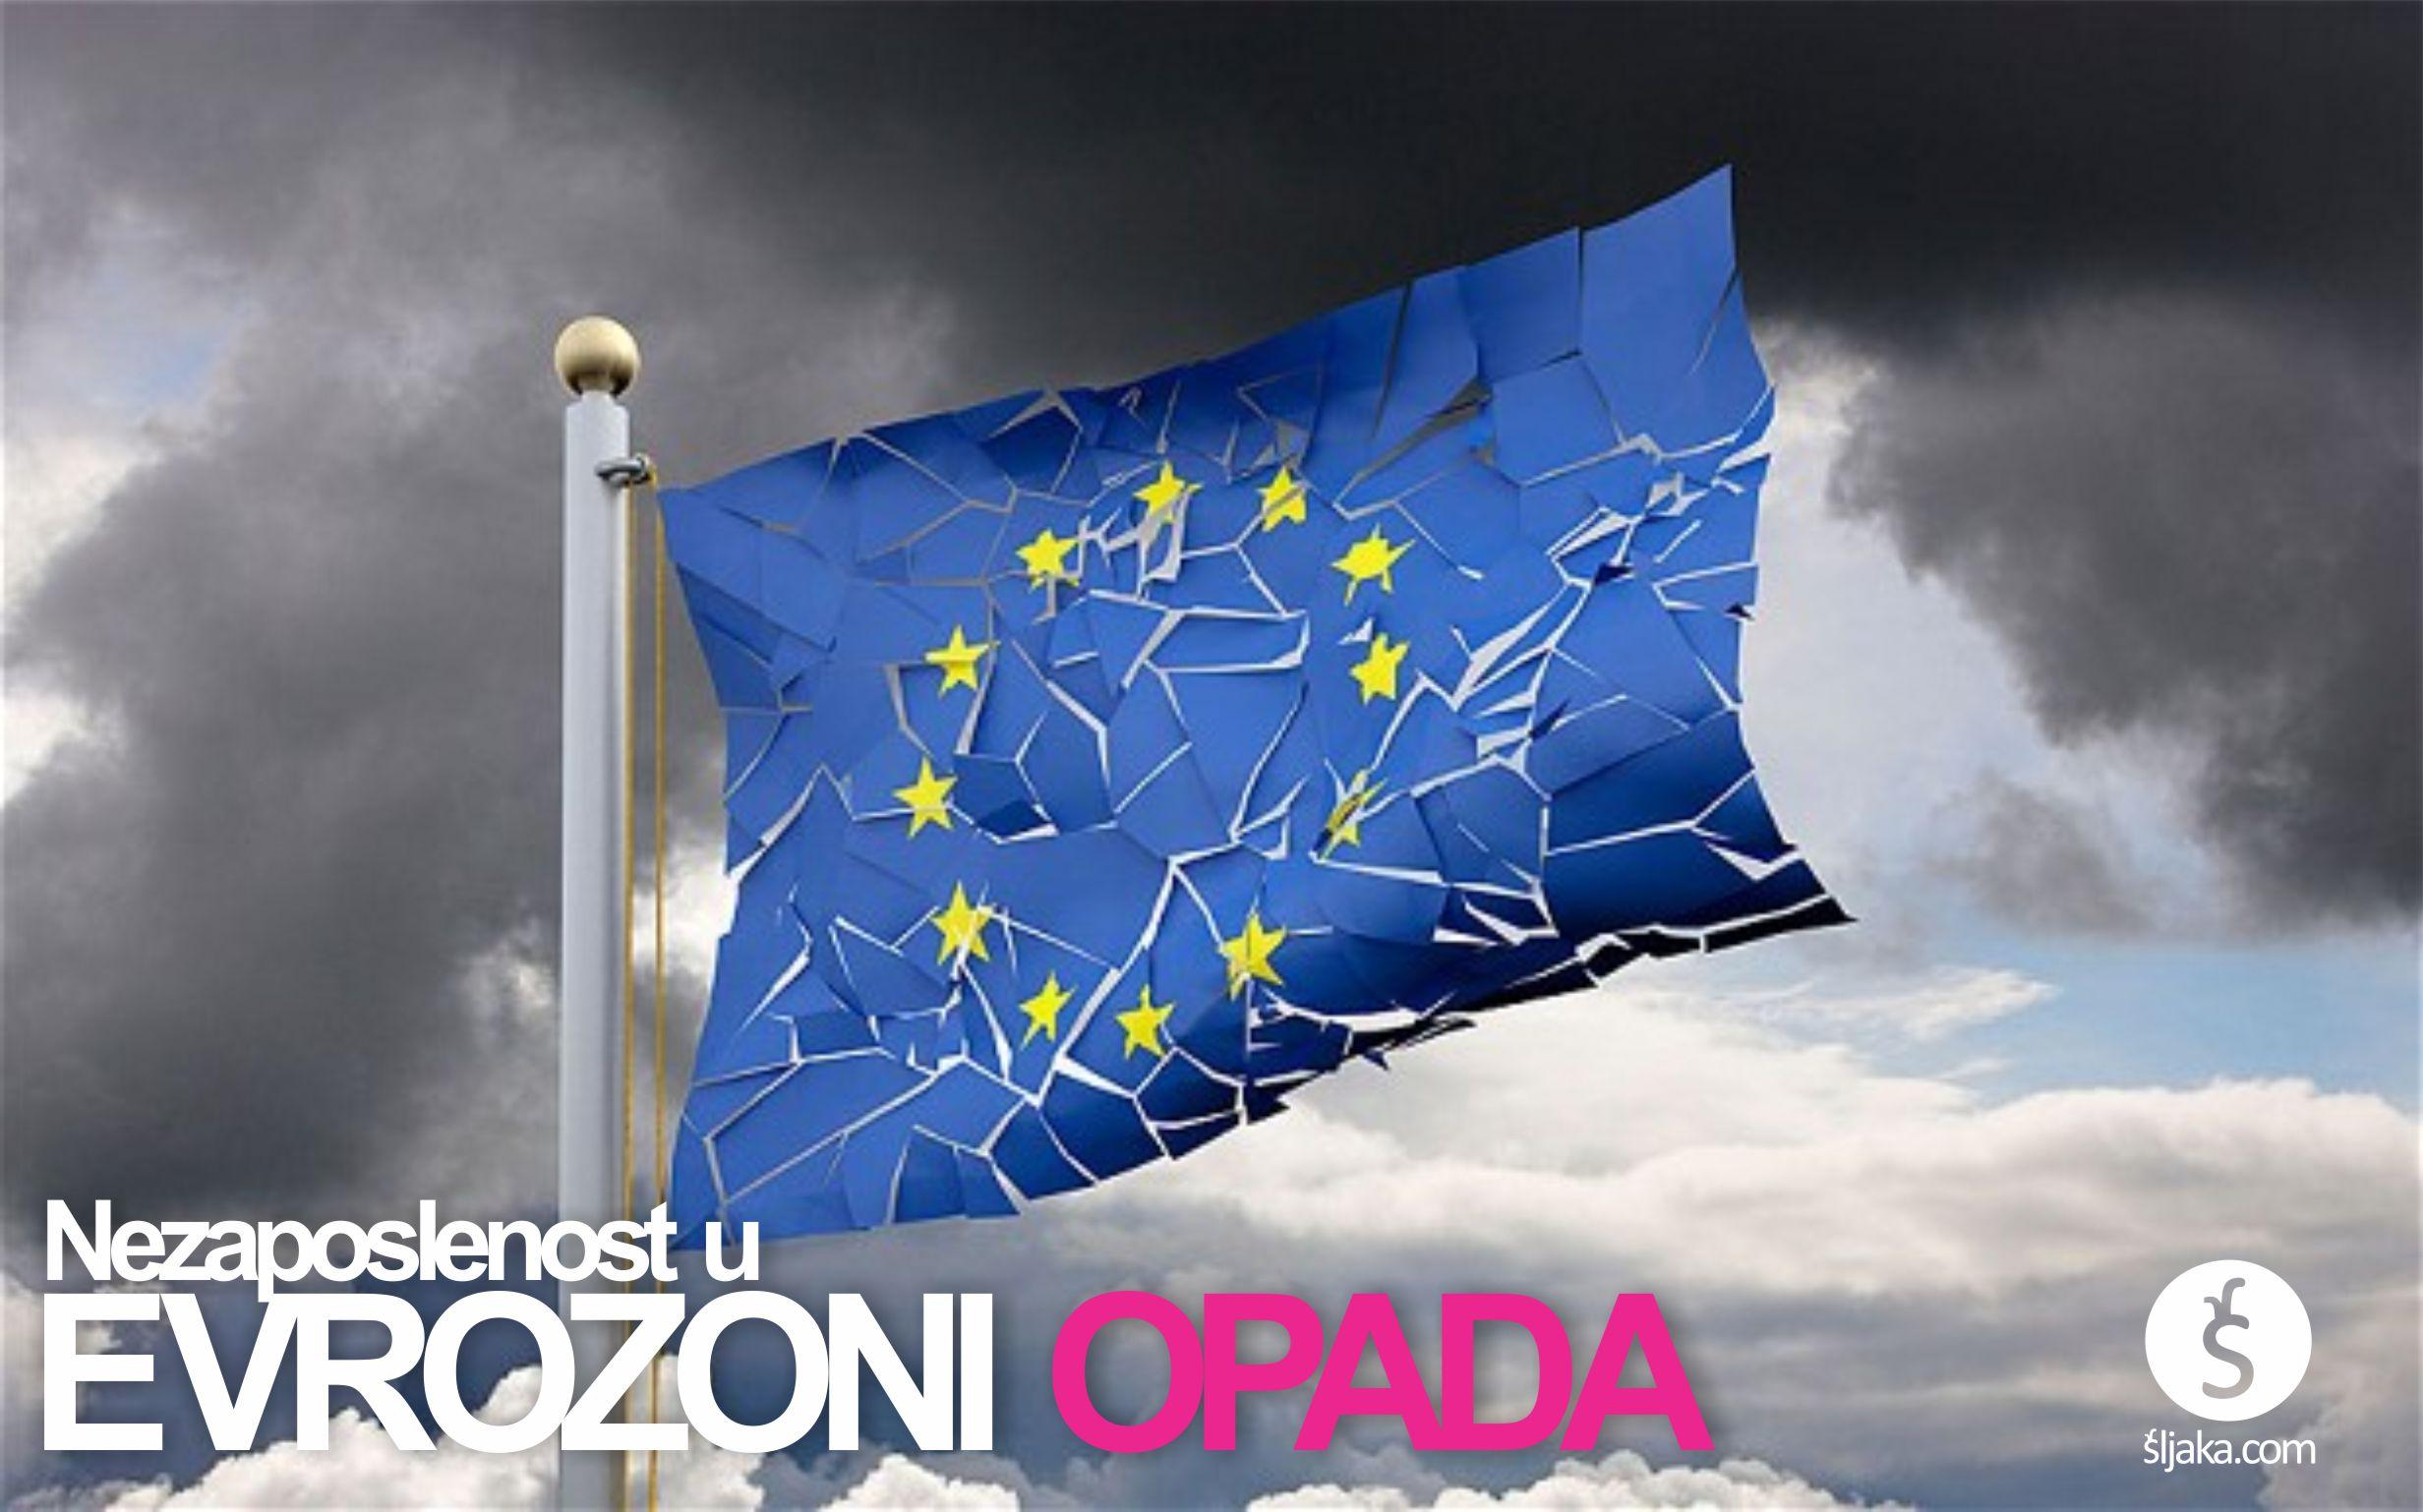 NezaposlenostEvrozona